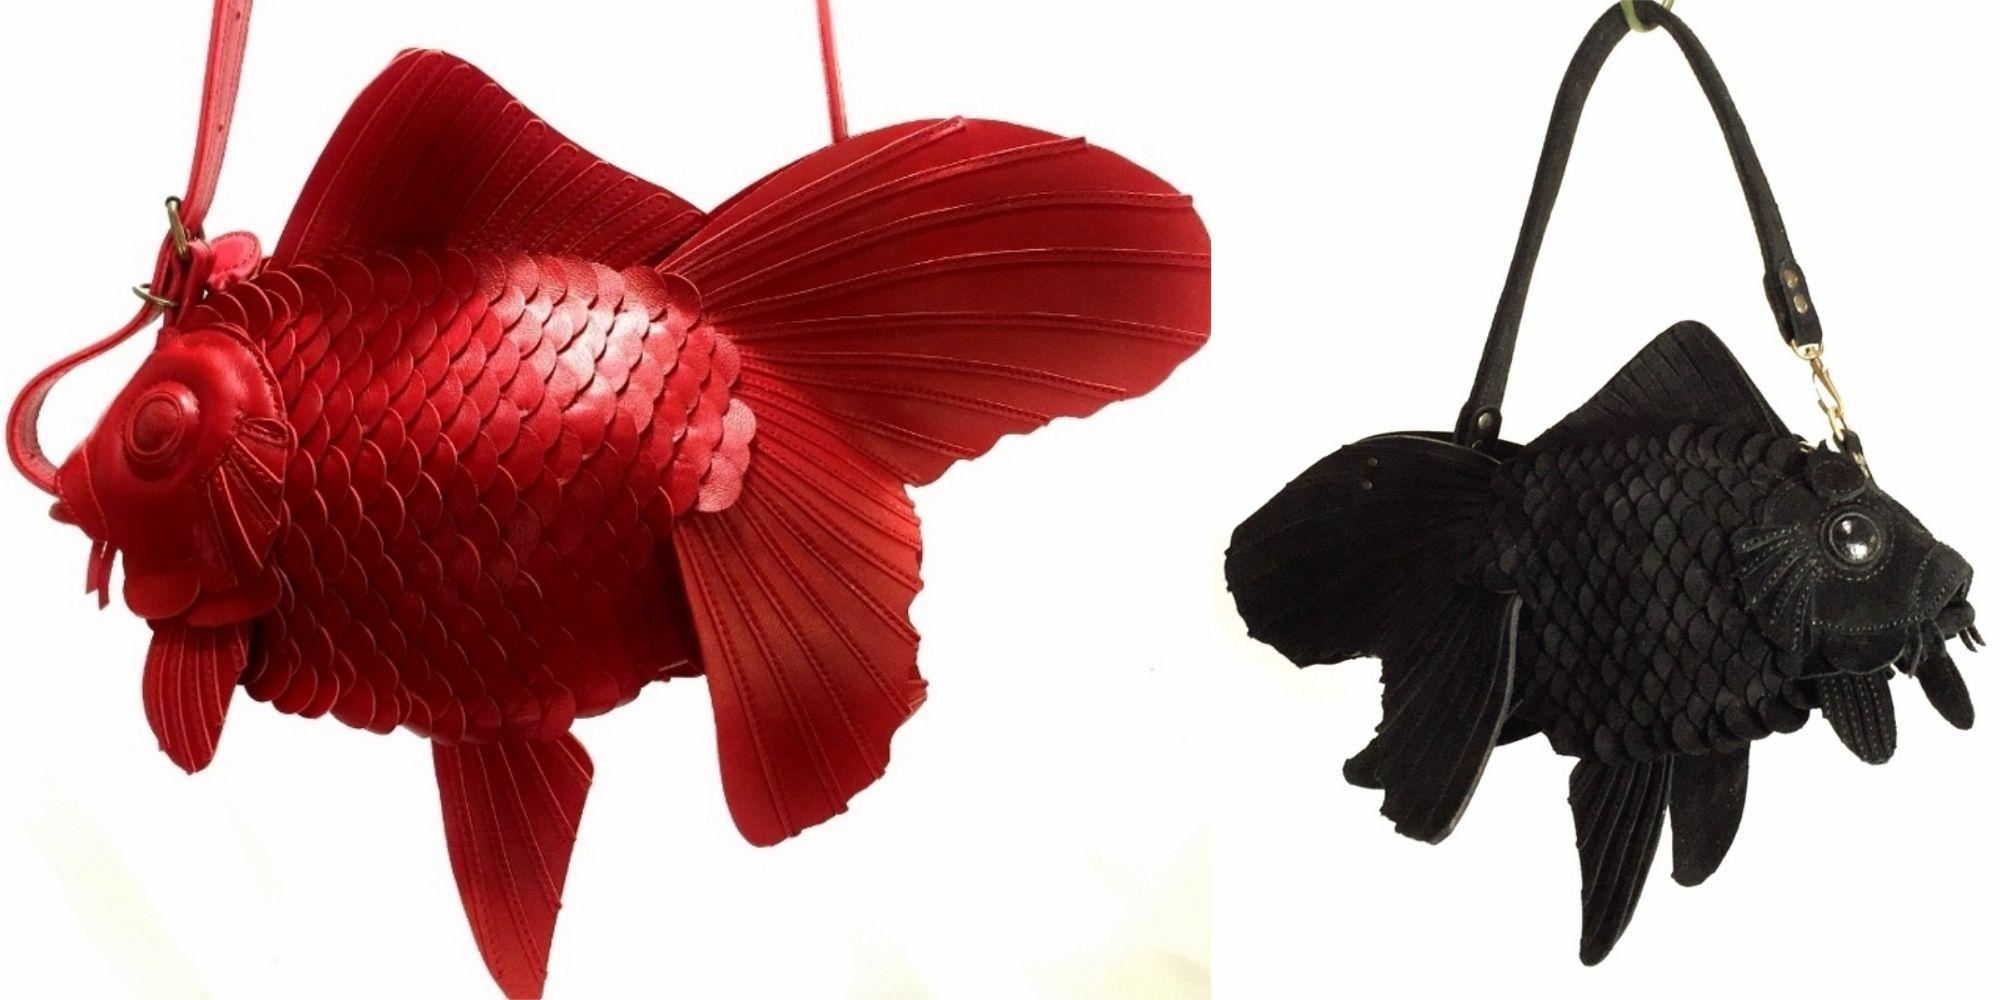 【ELLE怪奇物語】日本人對金魚的狂熱真的很誇張!這款包包根本一隻「活生生的金魚」啊!